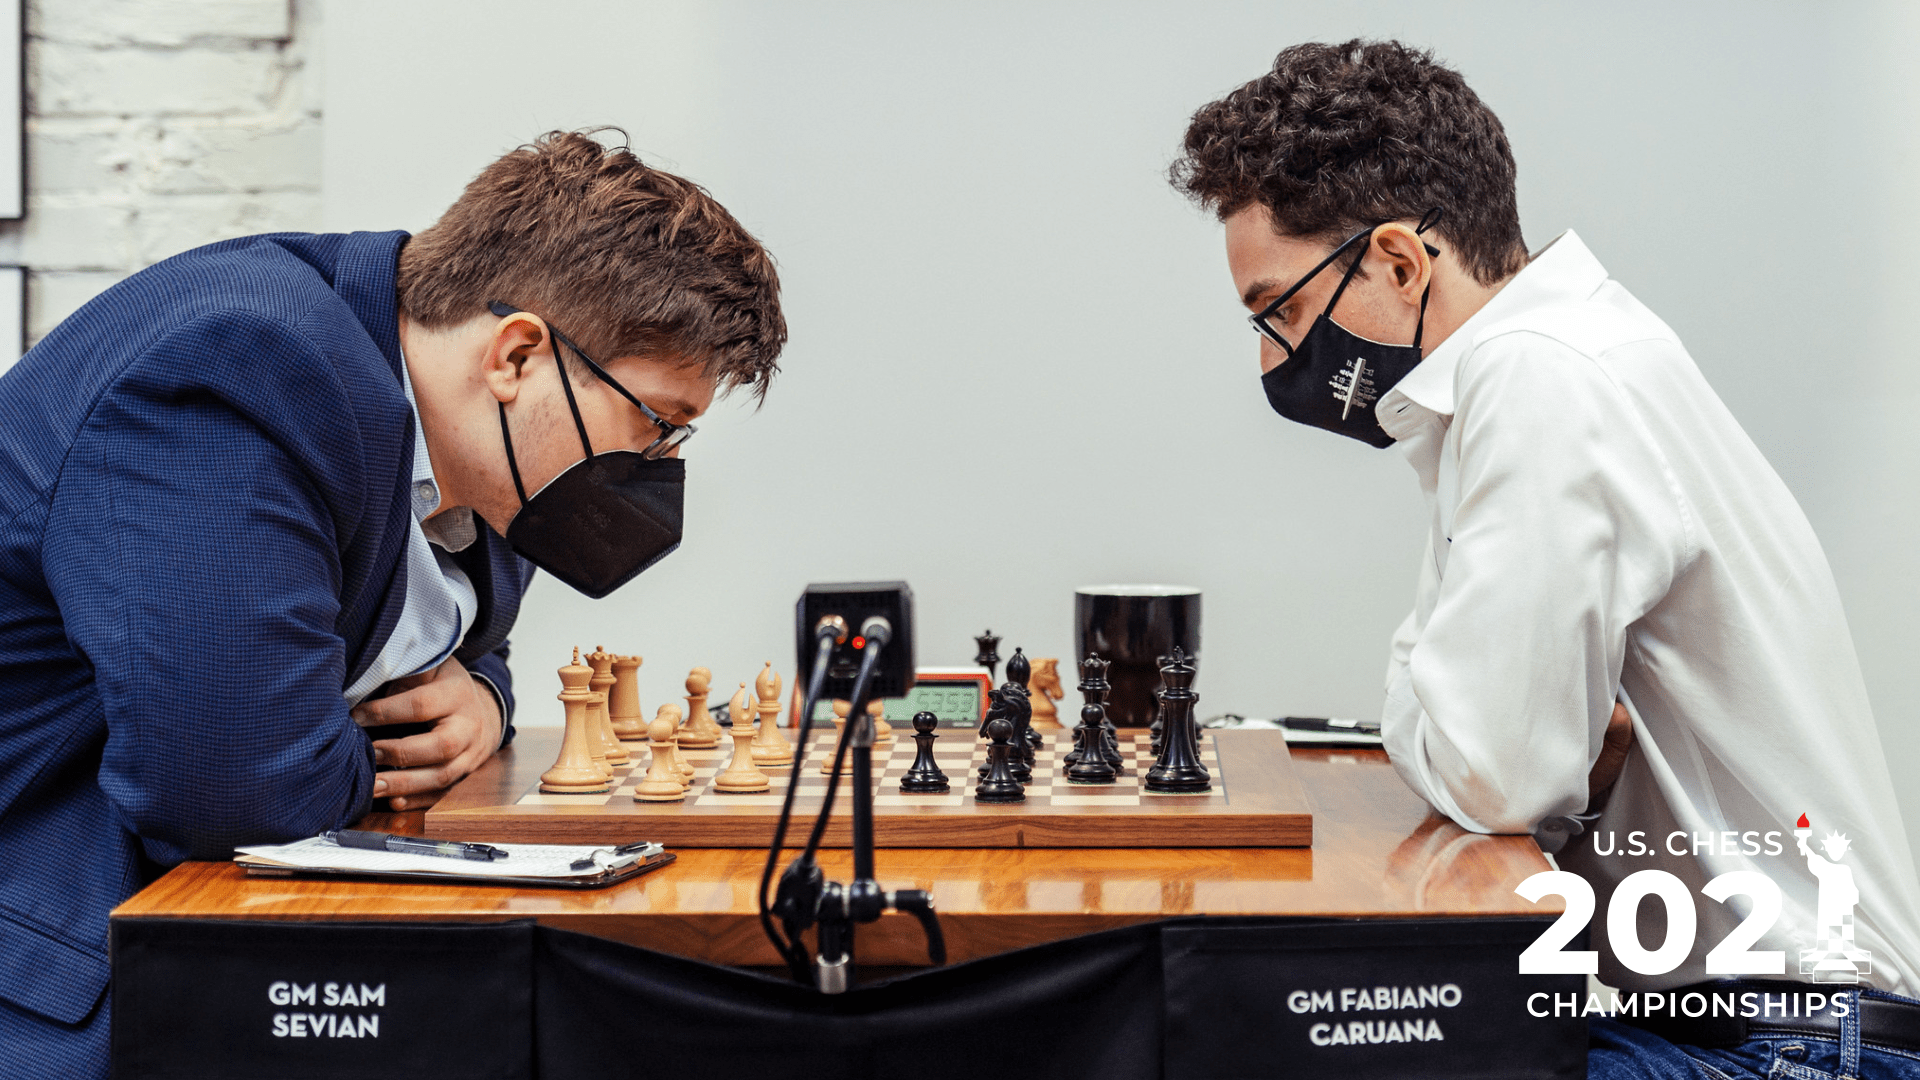 US Chess Championships R11: Caruana, So, Sevian Advance To Tiebreaks